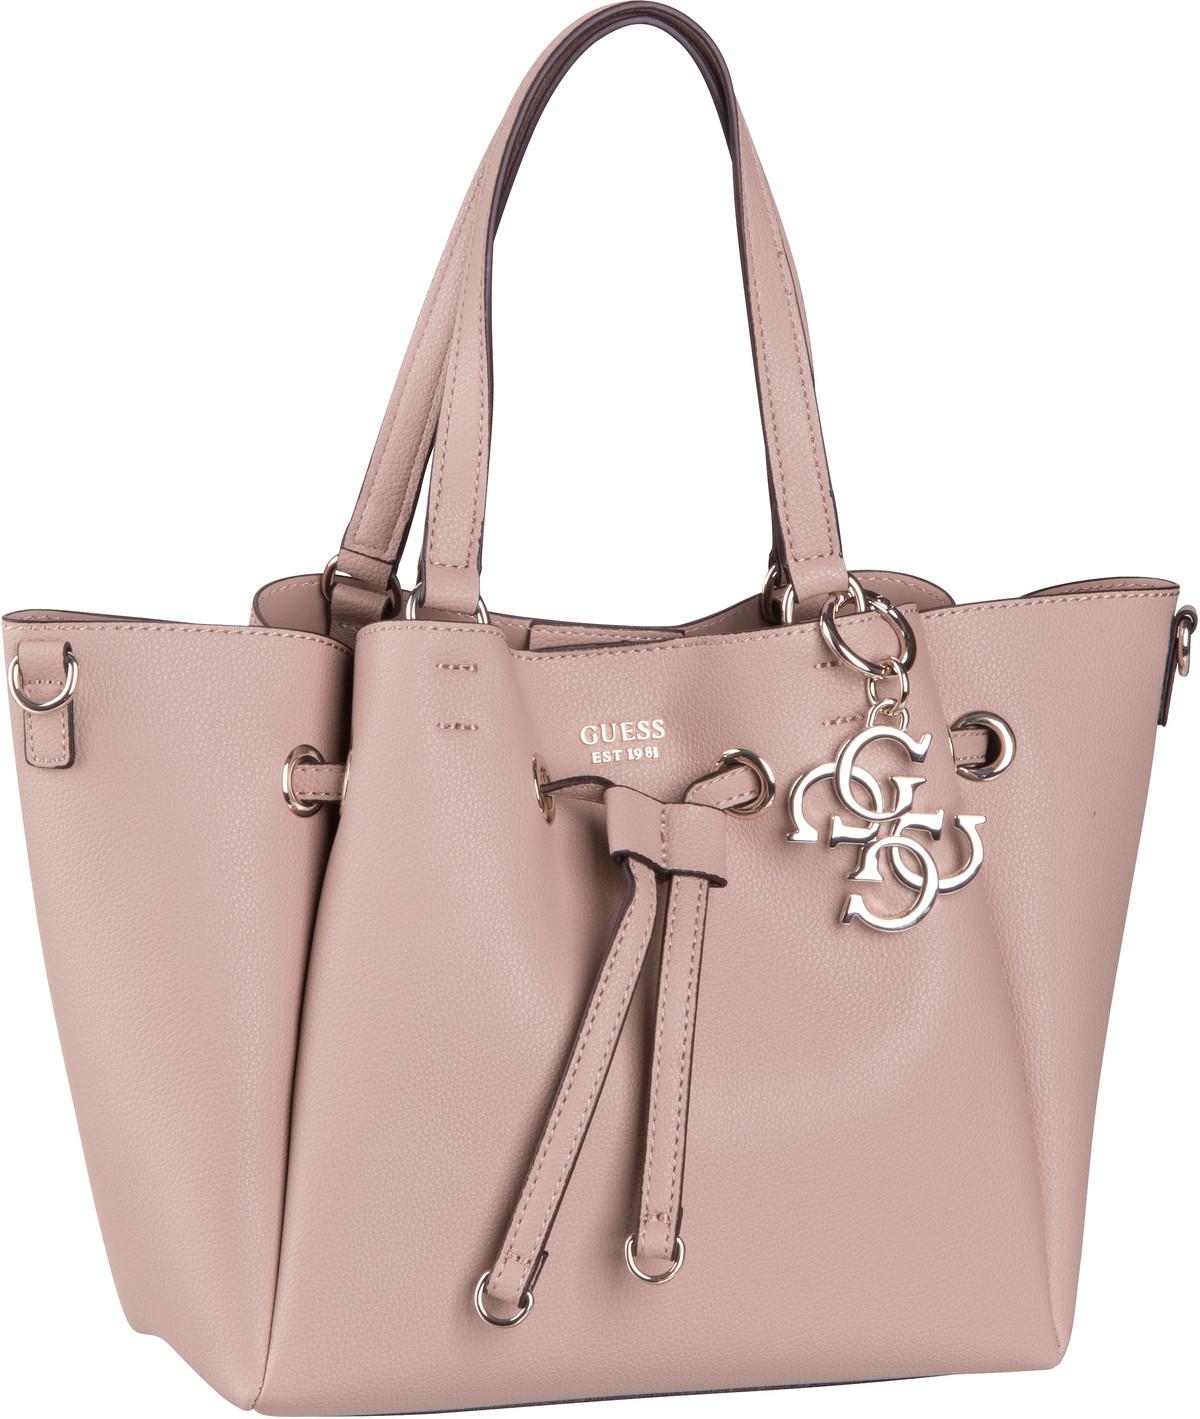 Handtasche Digital Drawstring Bag Dark Nude